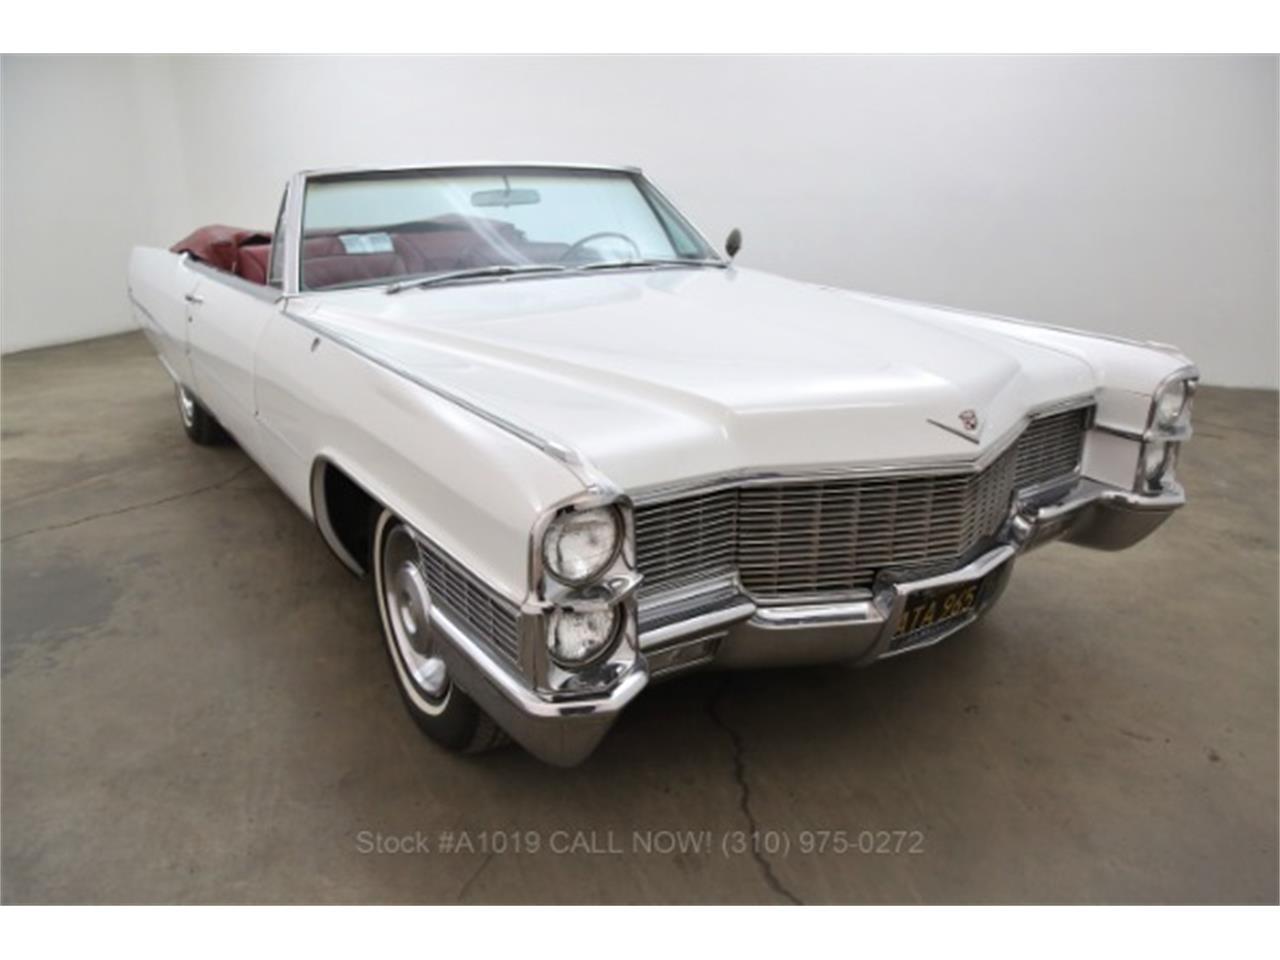 1965 Cadillac Coupe Deville For Sale Classiccars Com Cc 946289